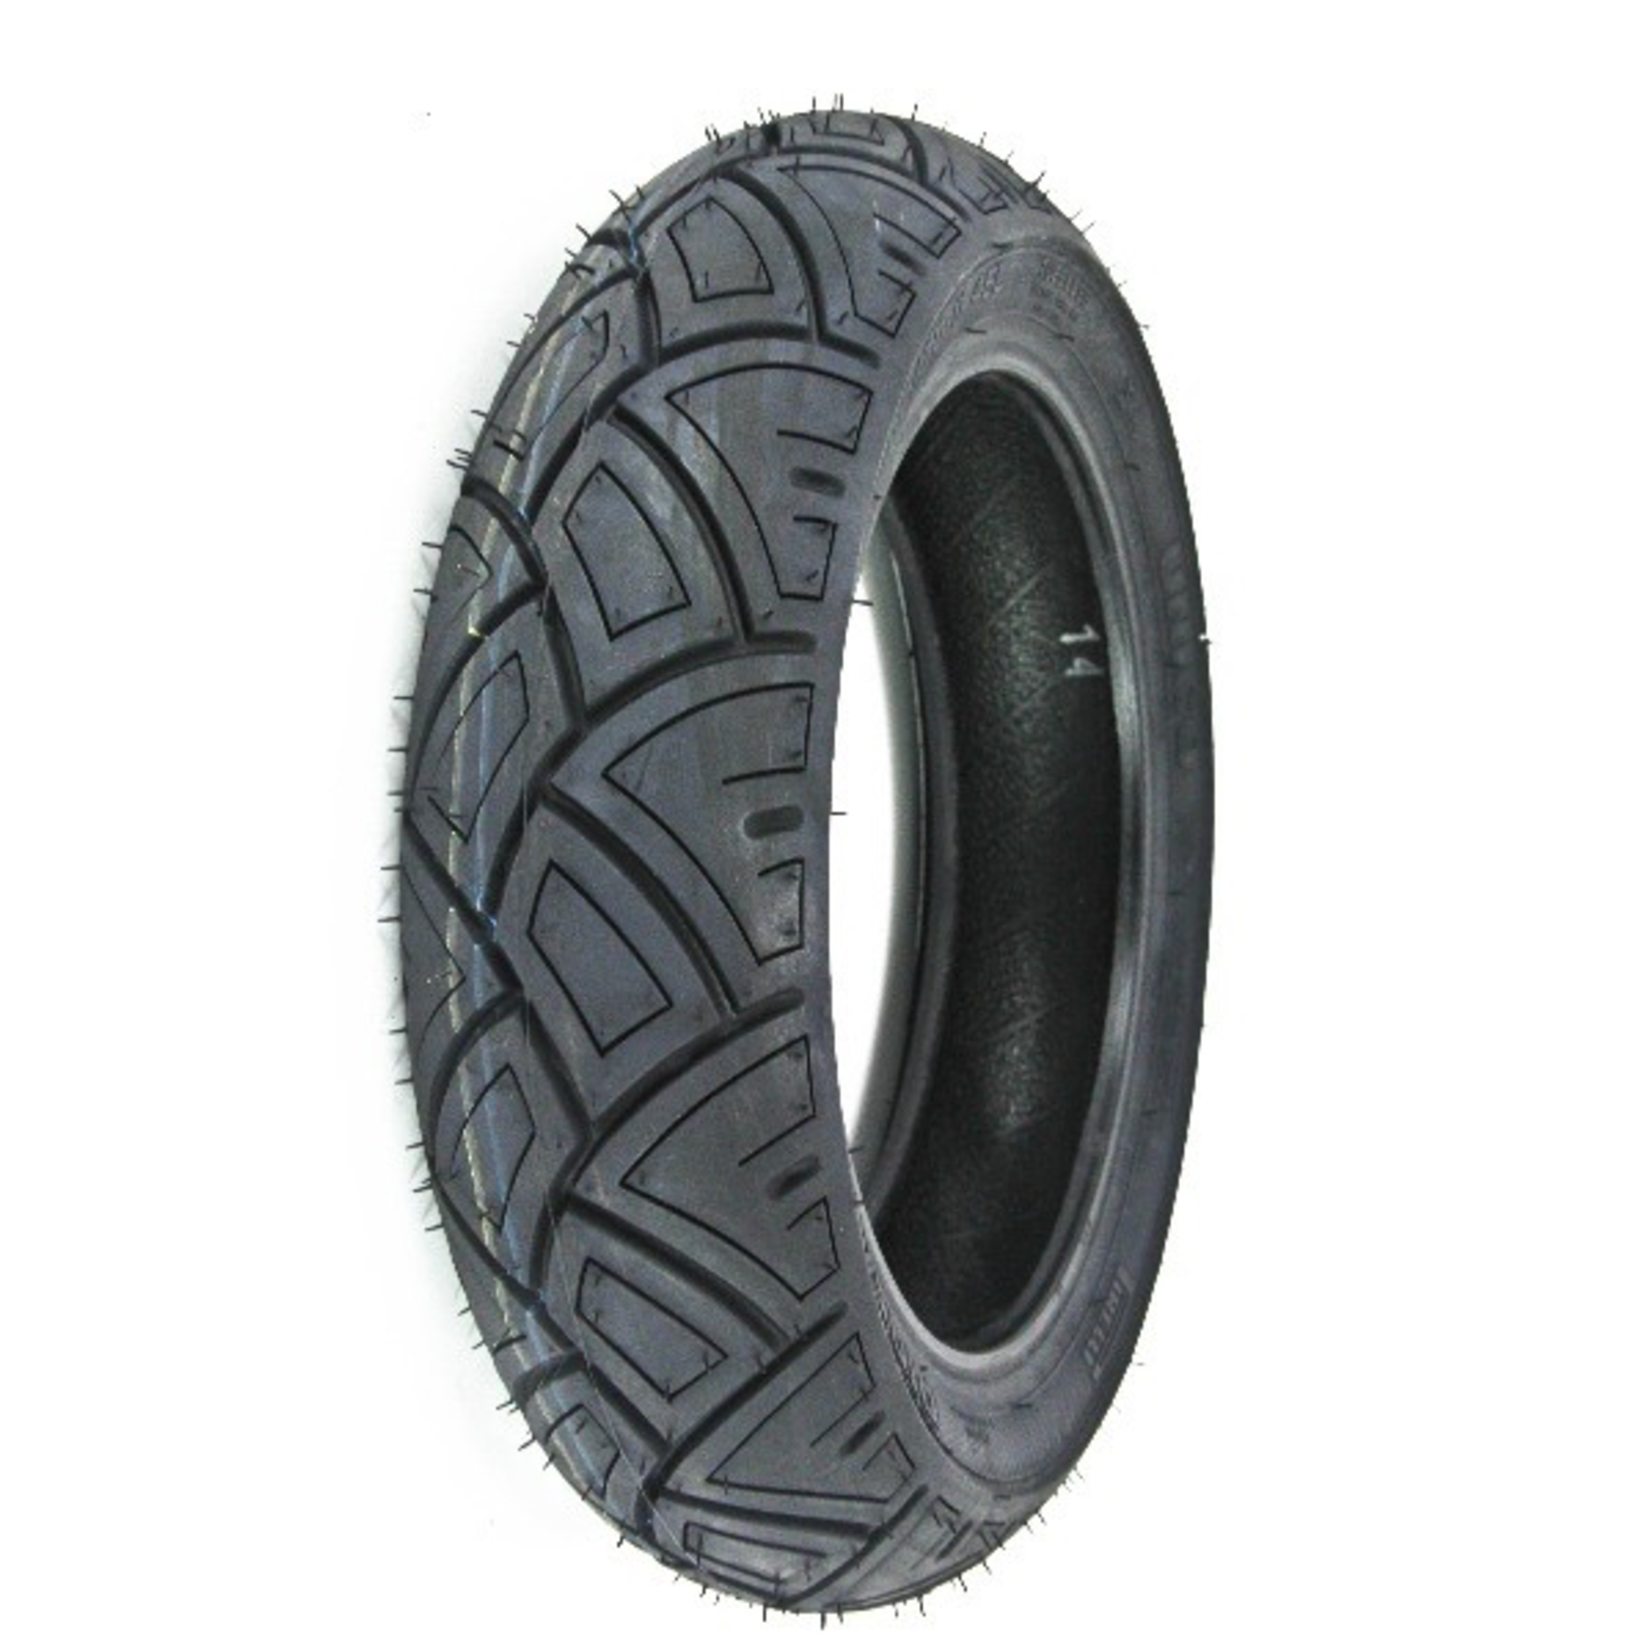 Parts Tire, 130/70-10 Pirelli SL38